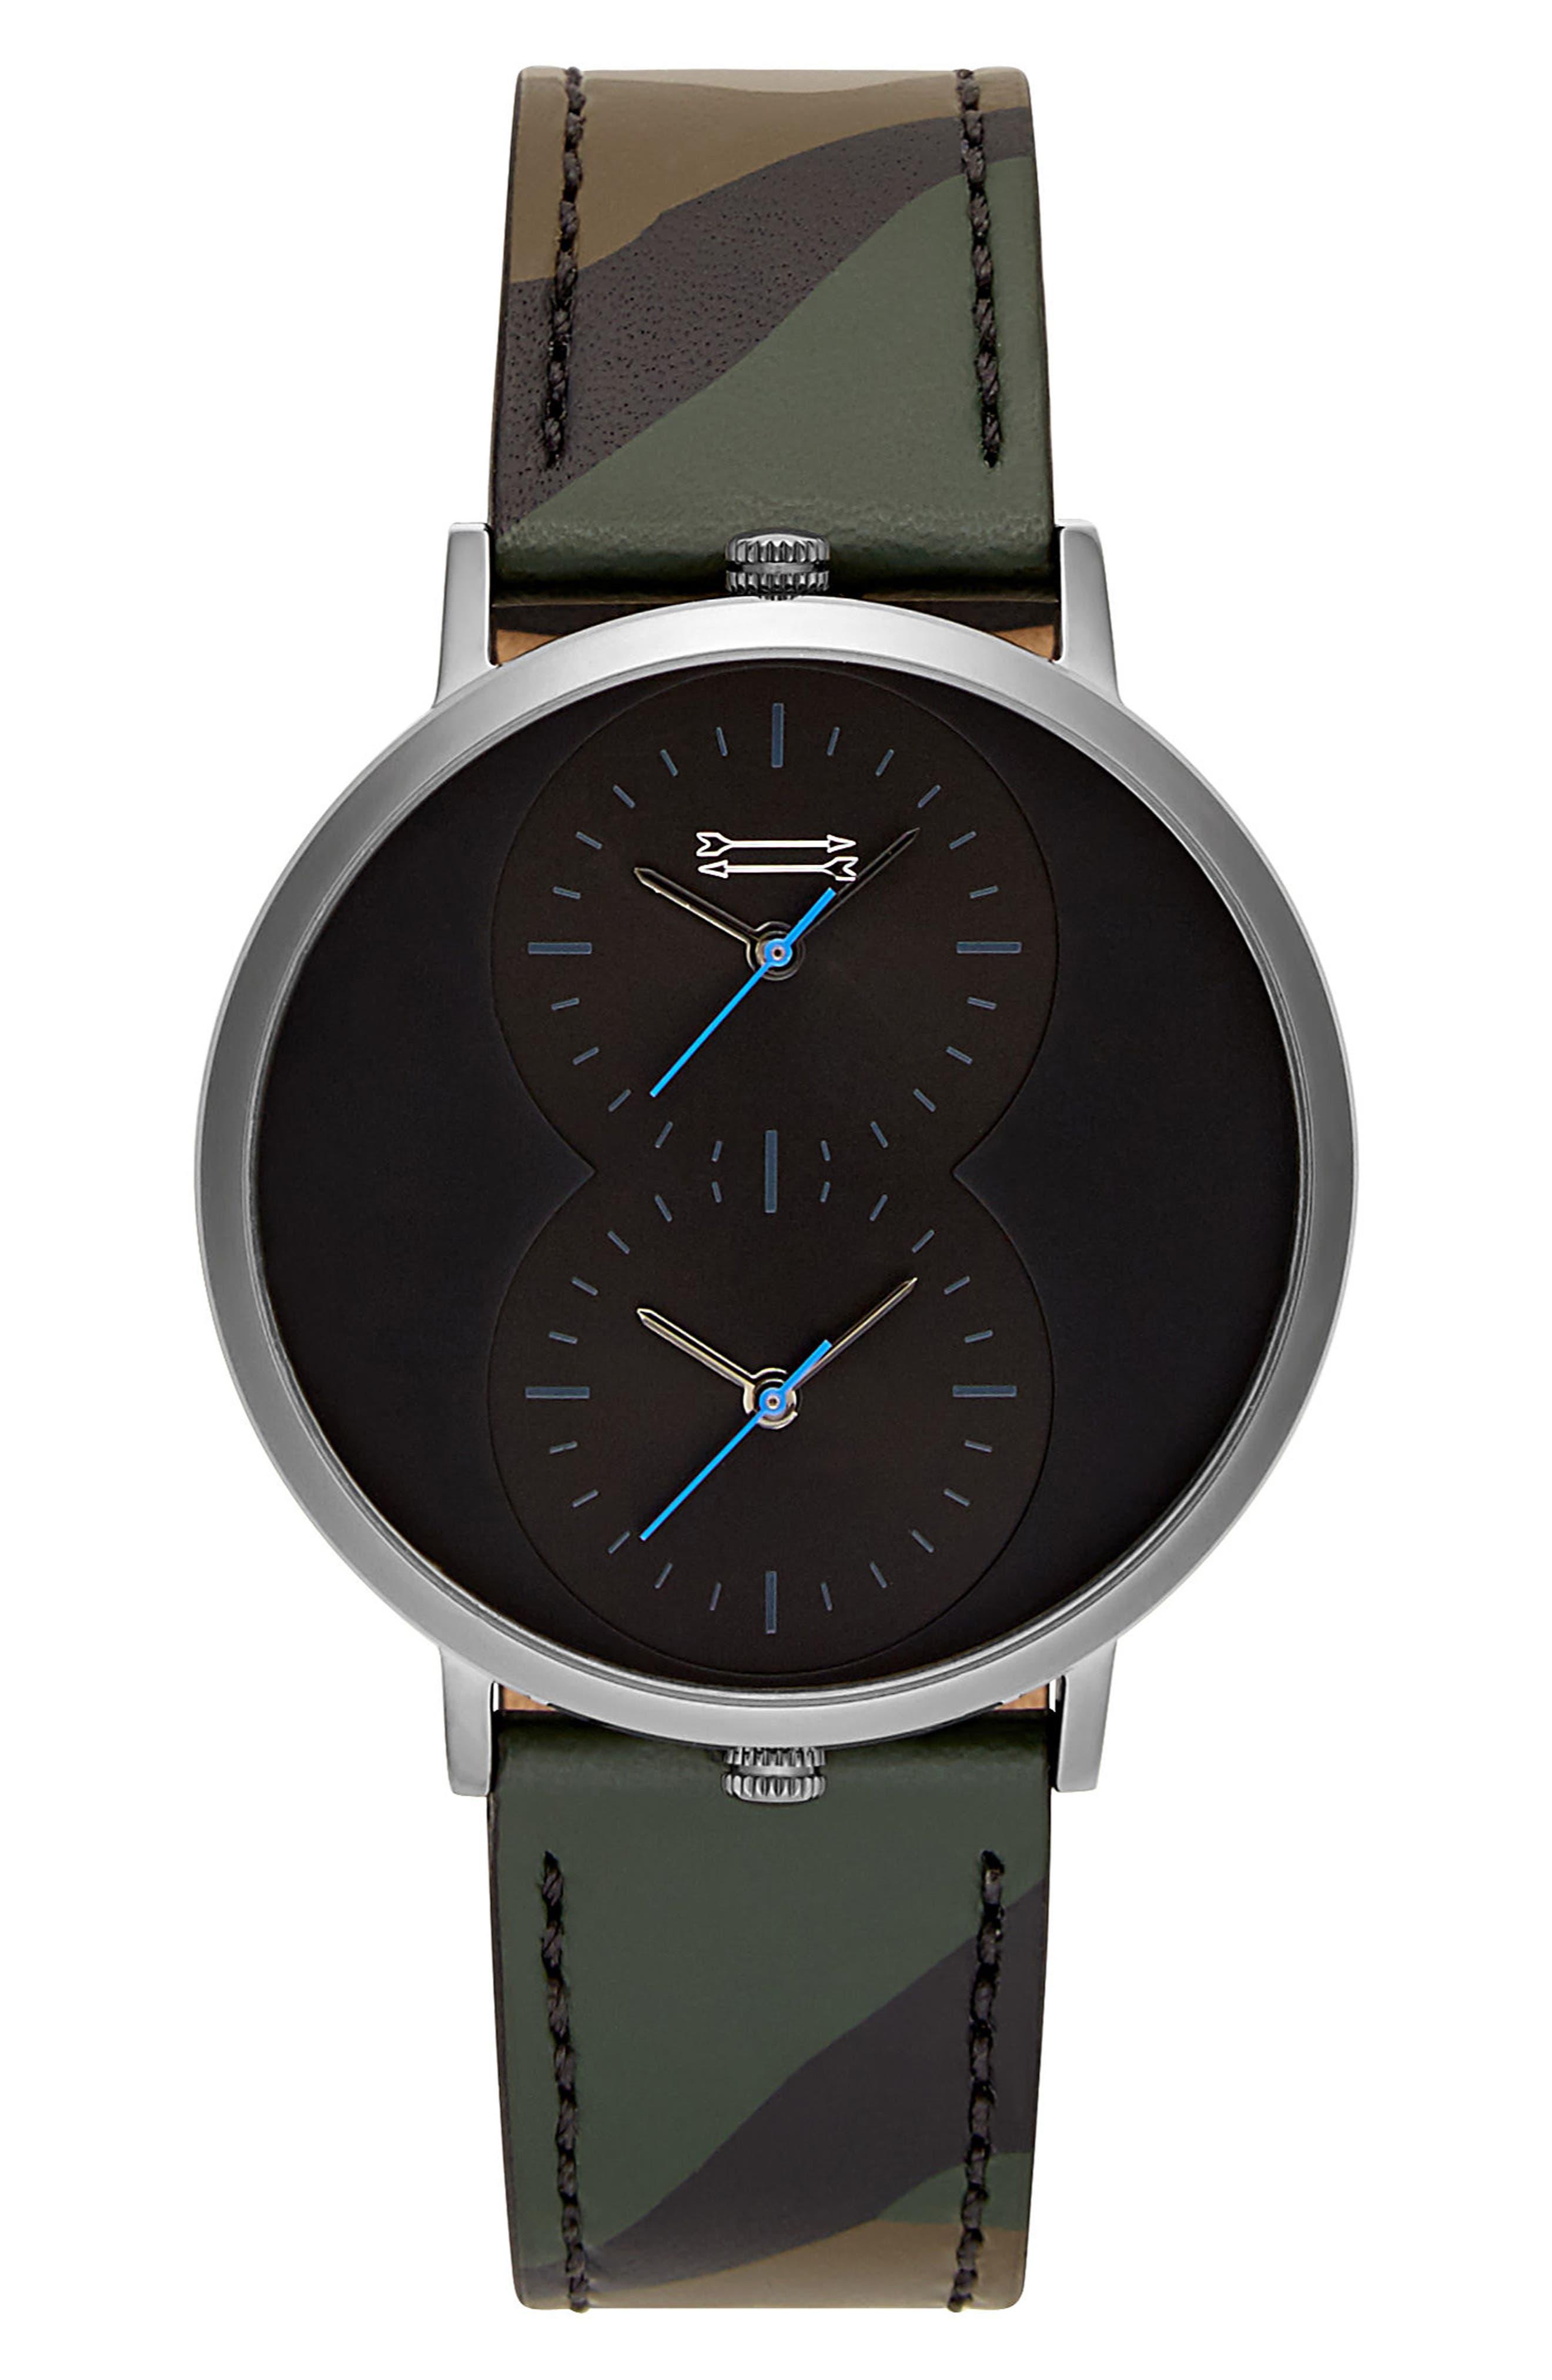 URI MINKOFF Griffith Leather Strap Watch, 43Mm in Camo/ Black/ Gunmetal